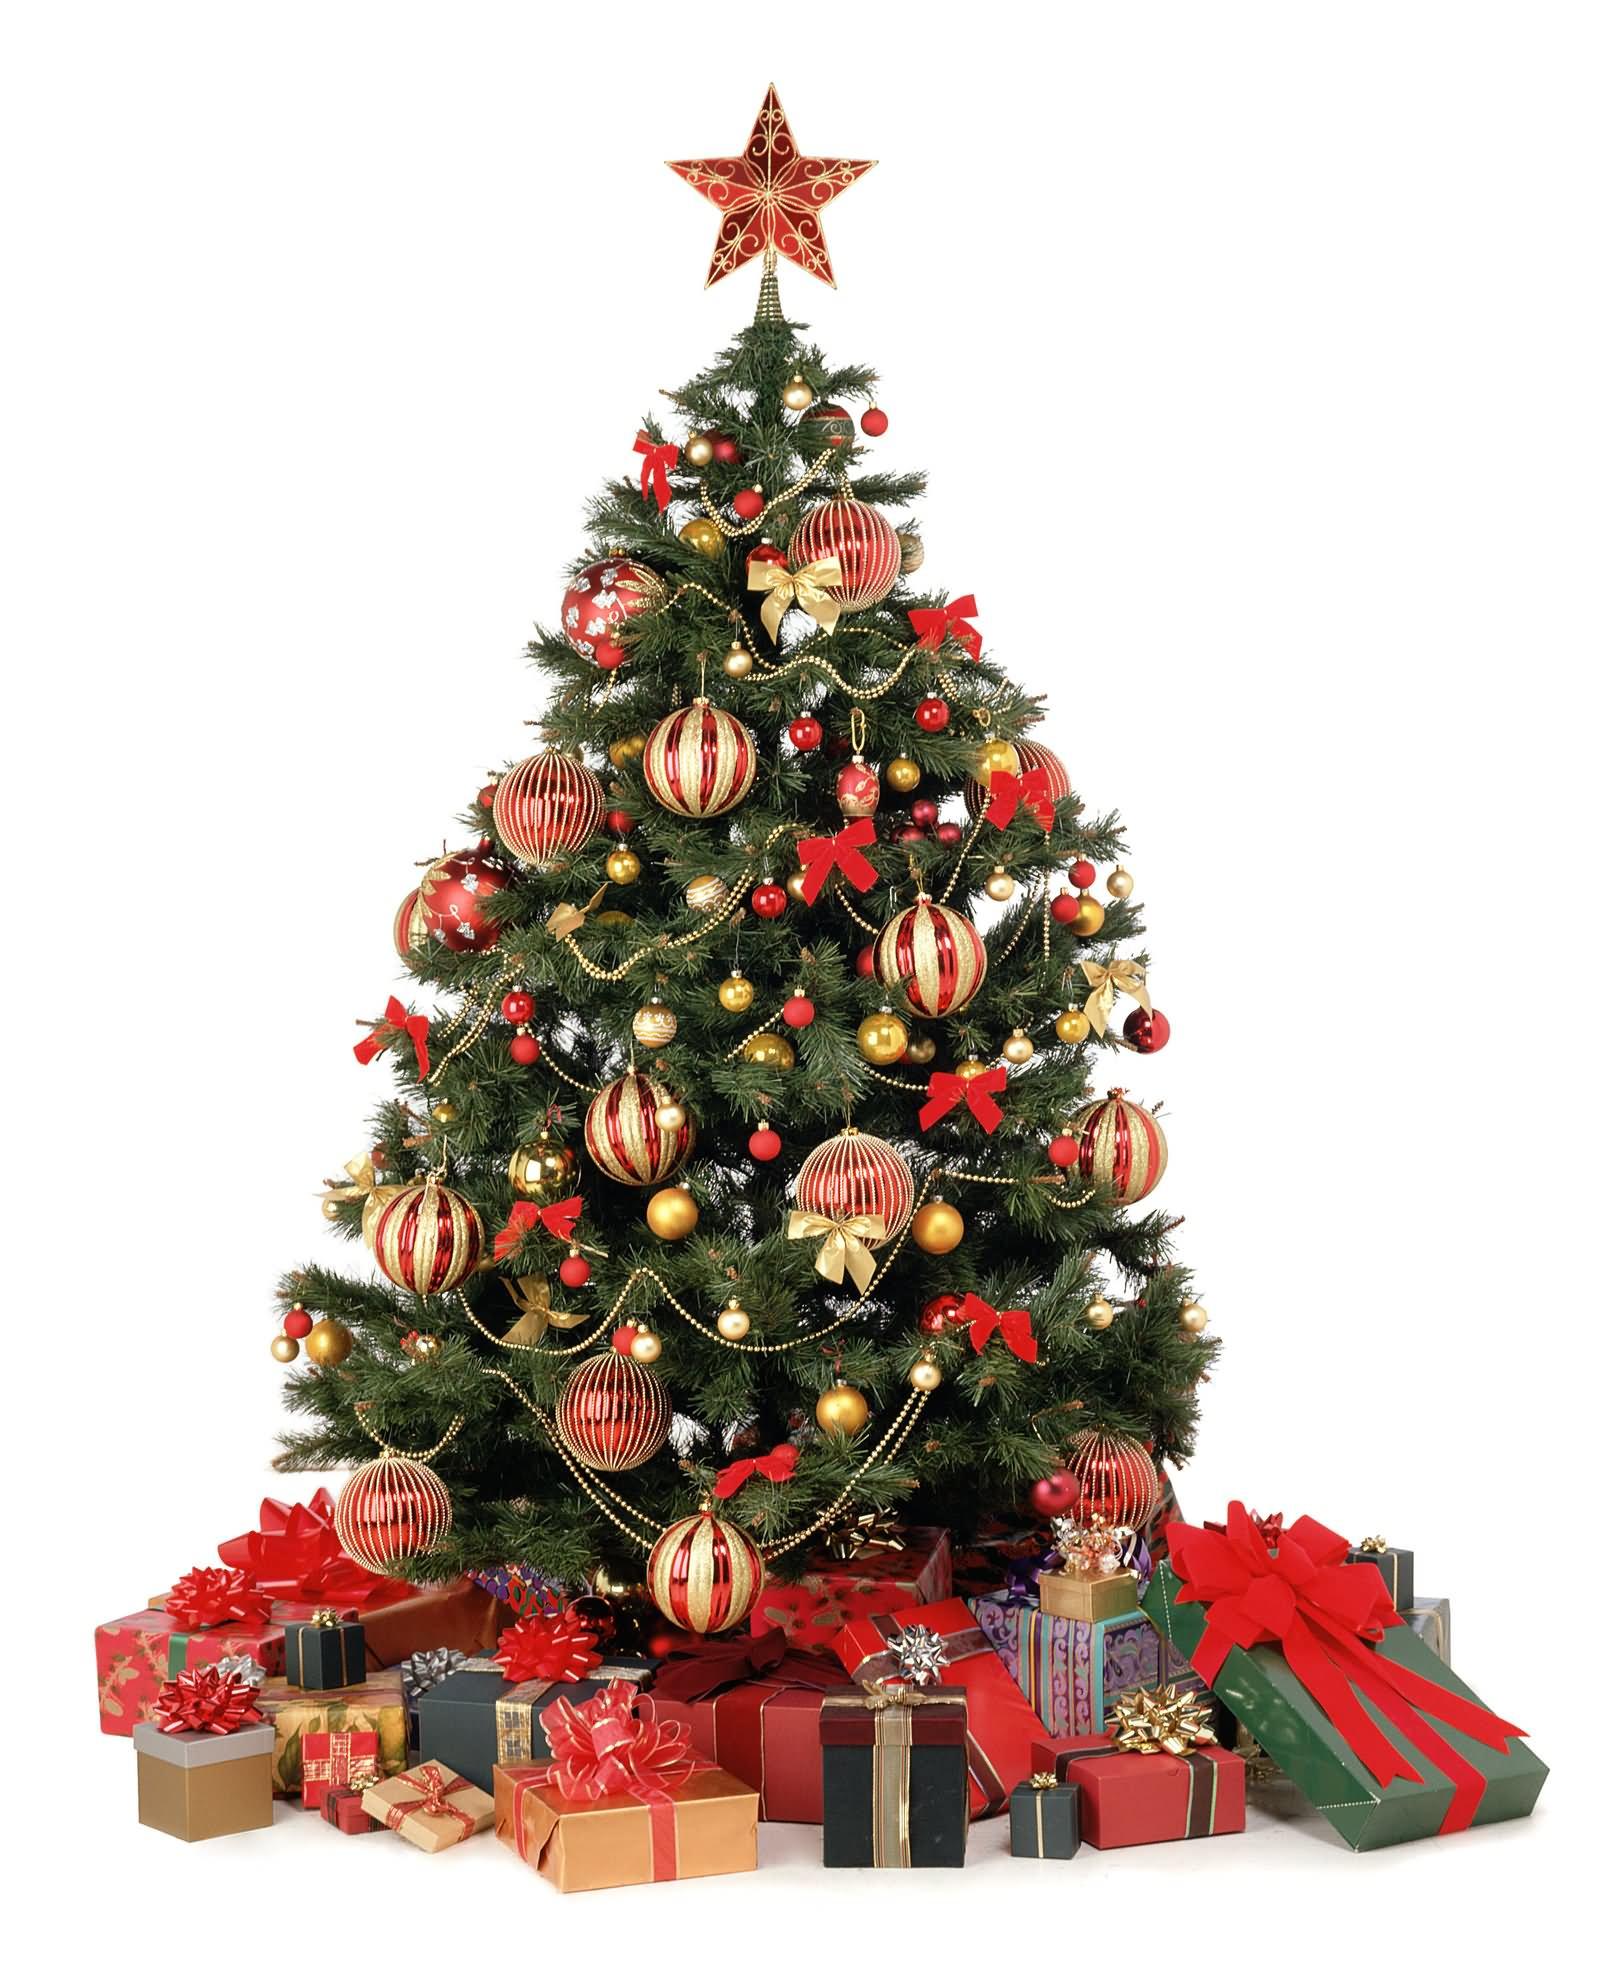 christmas tree decoration and gifts rh askideas com Christmas Light Strand Beautiful Christmas Wallpaper Backgrounds